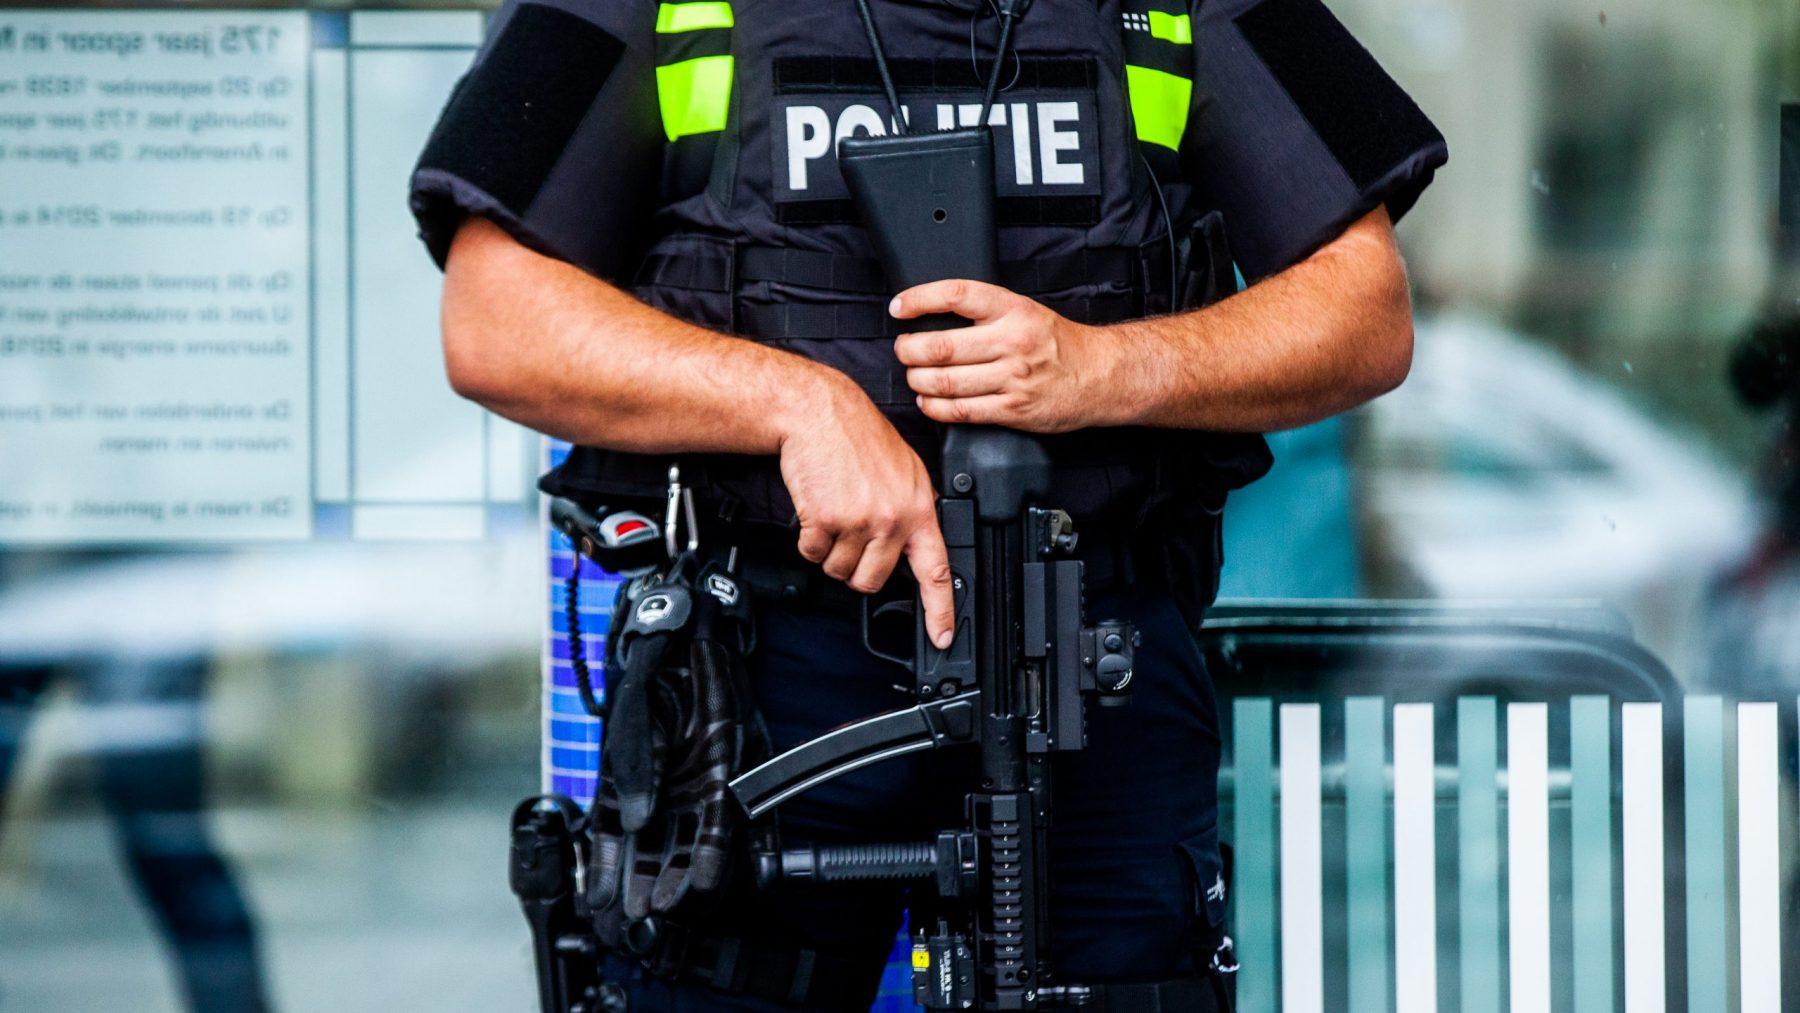 Dreigingsniveau omlaag, minder kans op terroristische aanslag in Nederland